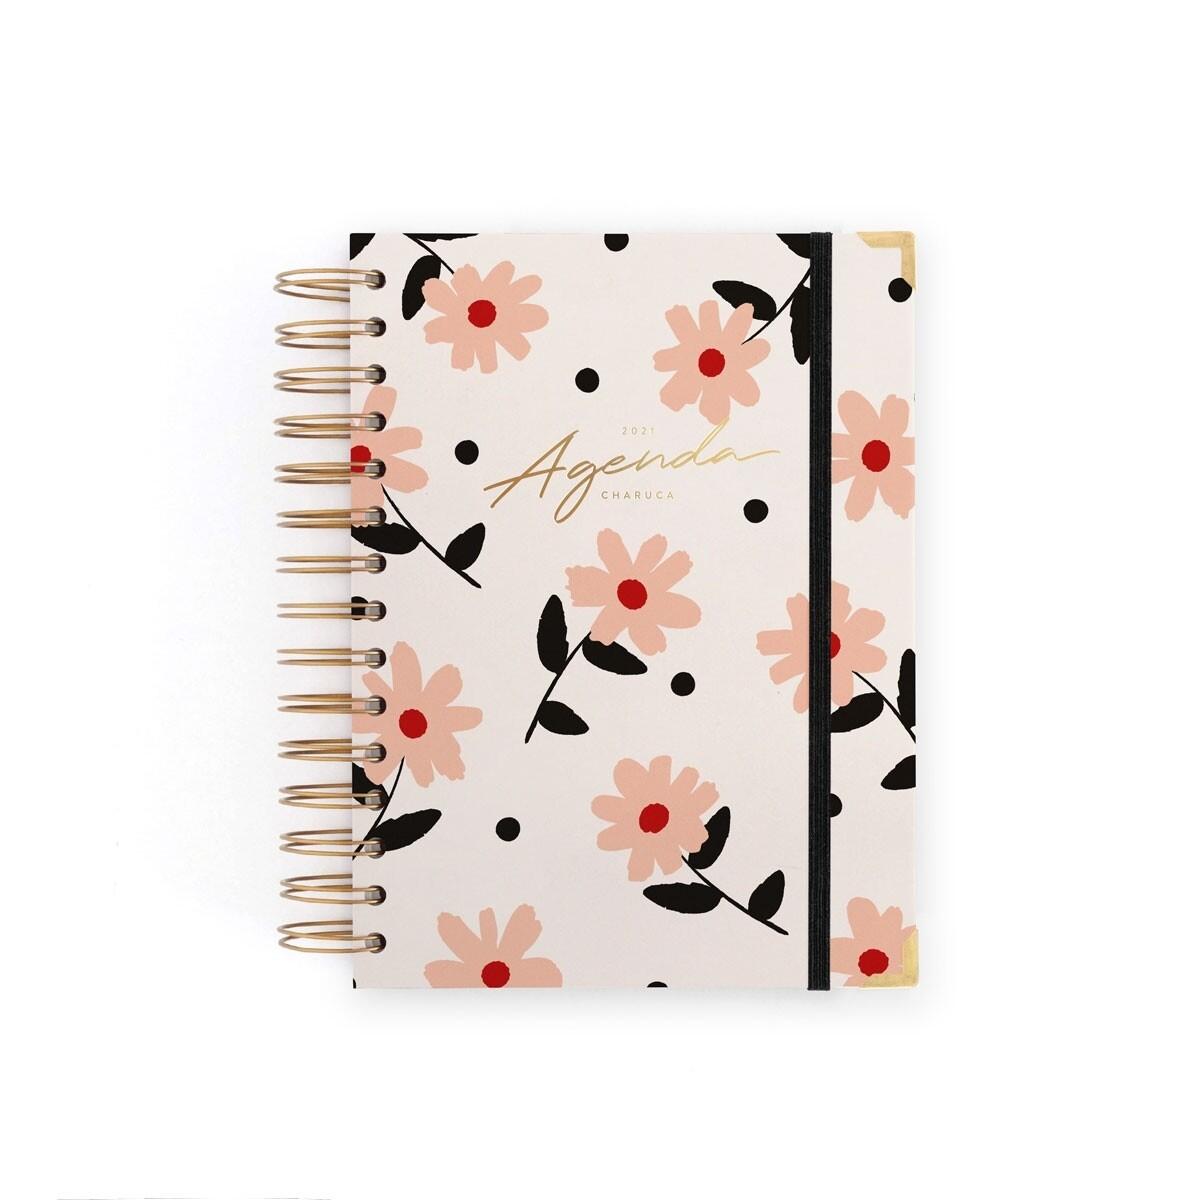 Agenda Charuca Floral- Mediana Diaria